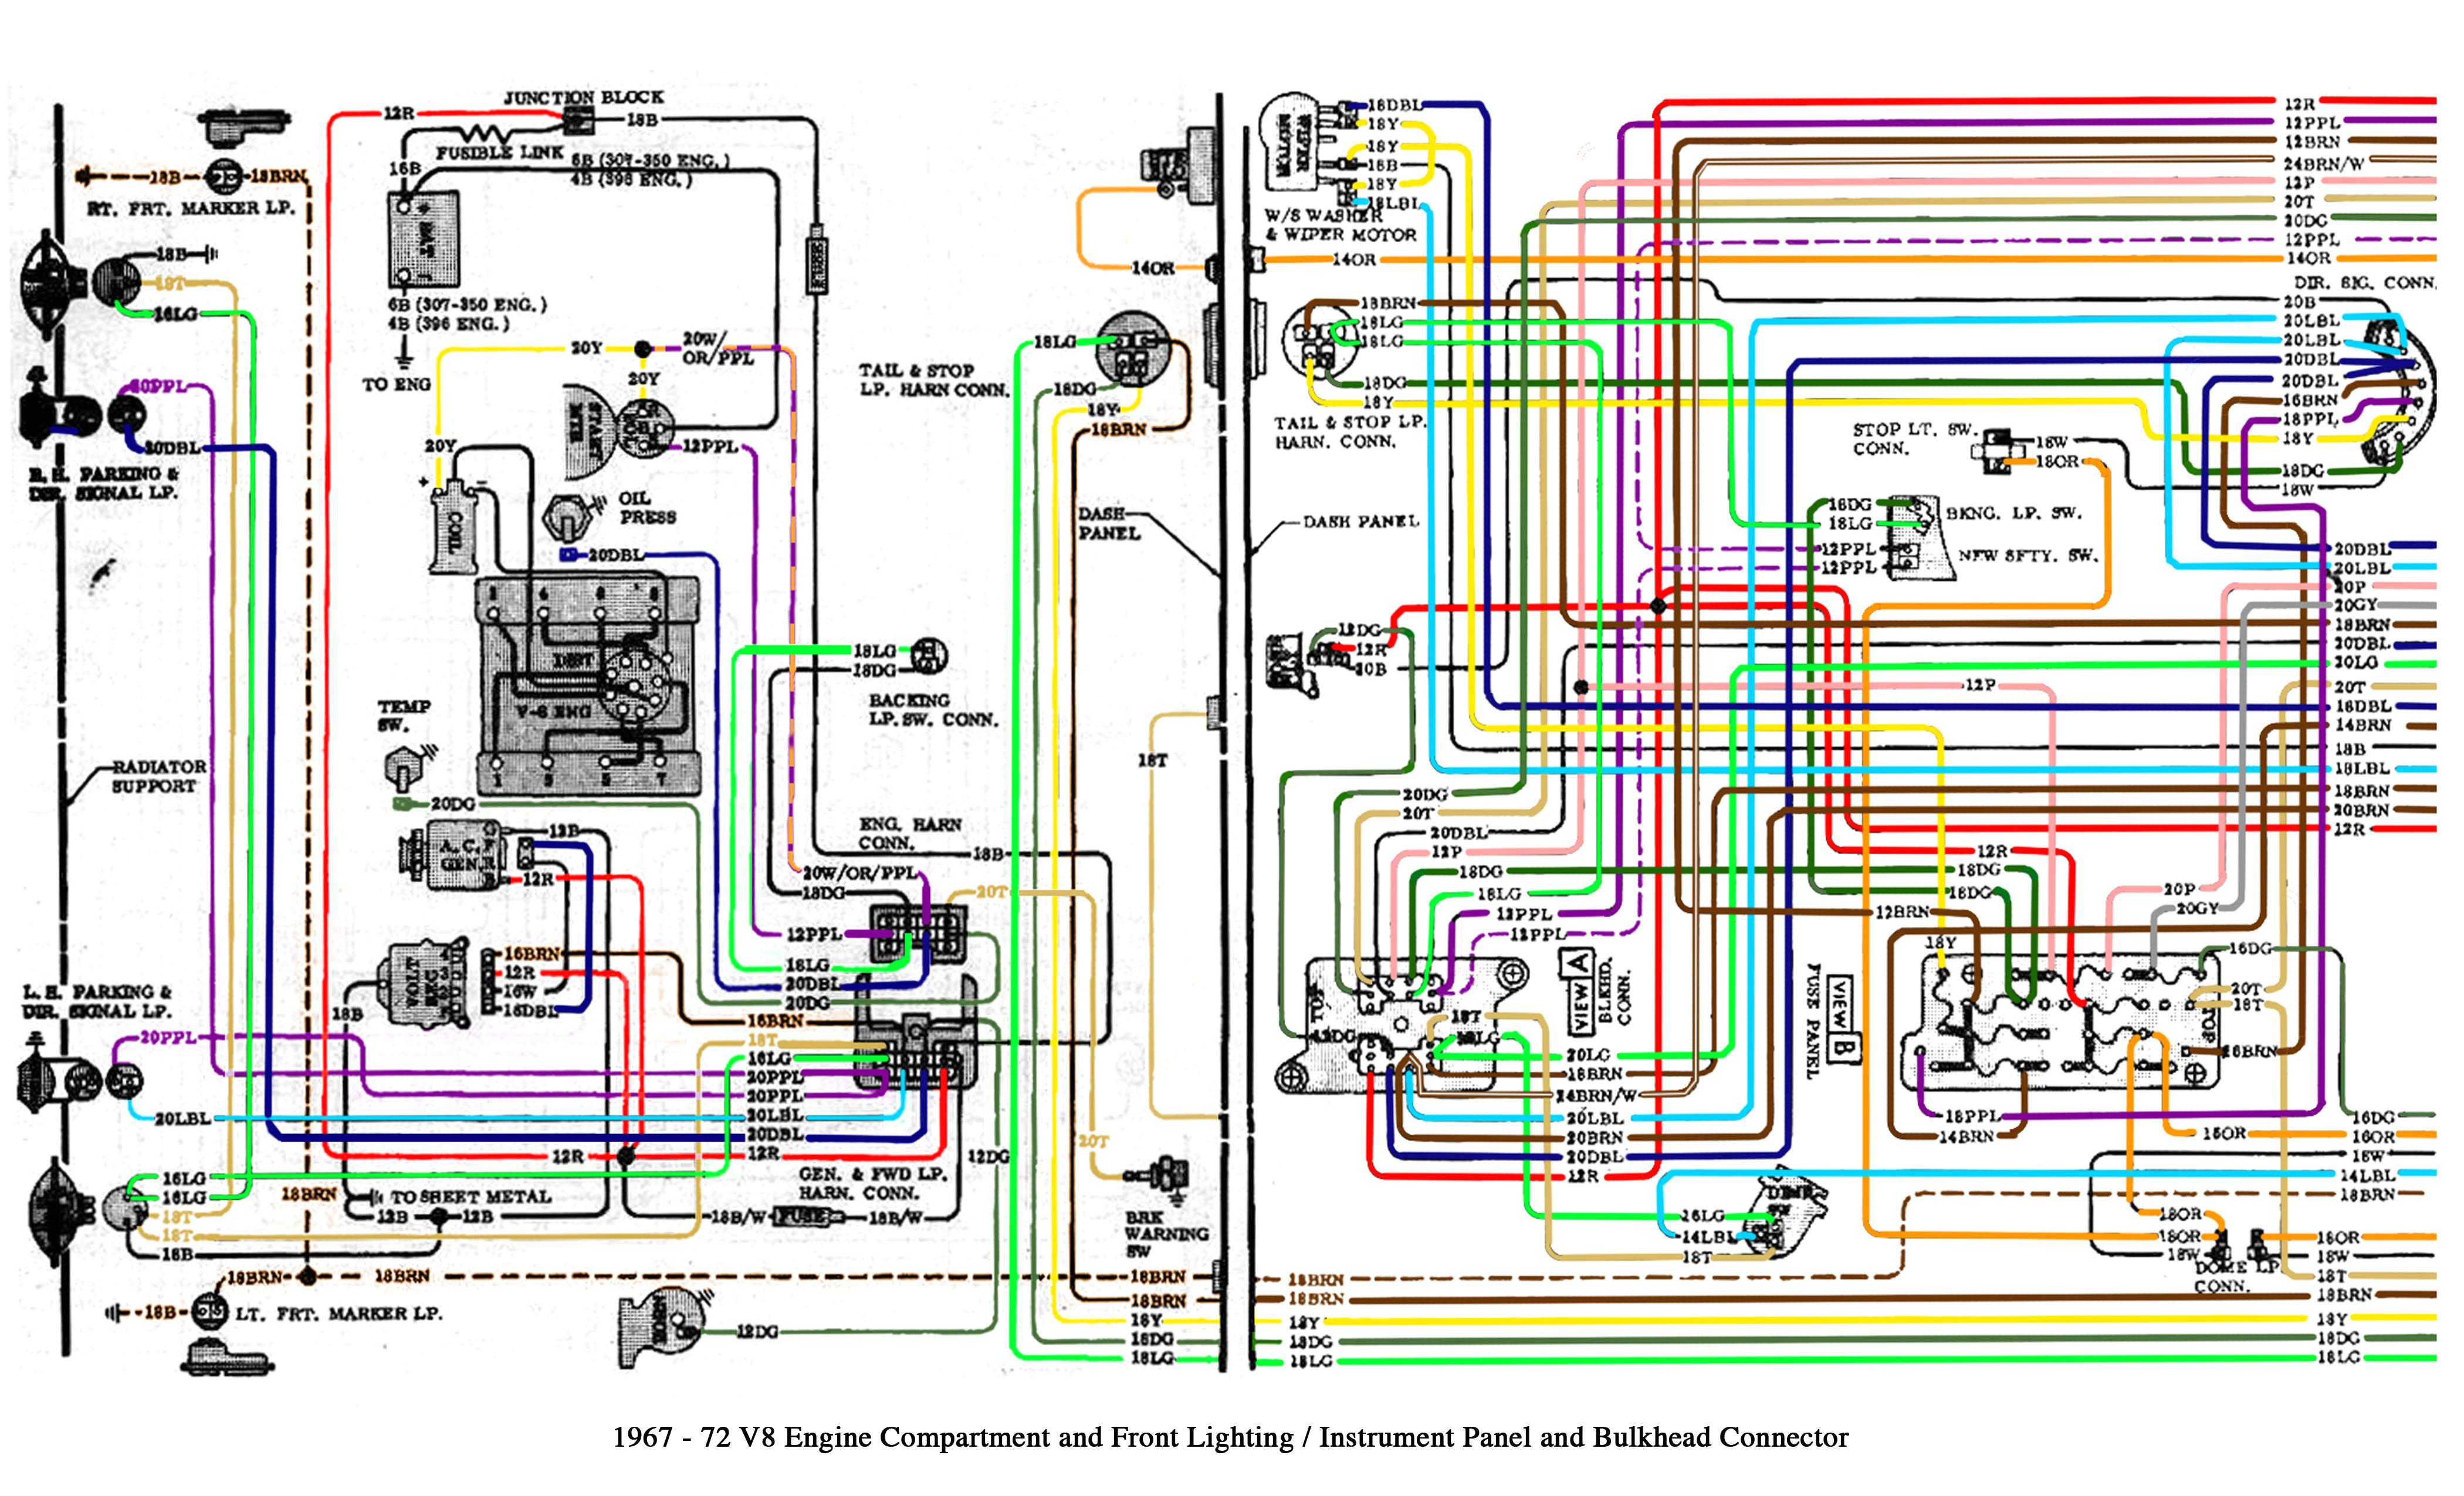 1968 chevy truck wiring diagram home wiring diagram 1968 gmc truck wiring diagram 1968 gmc wiring diagram